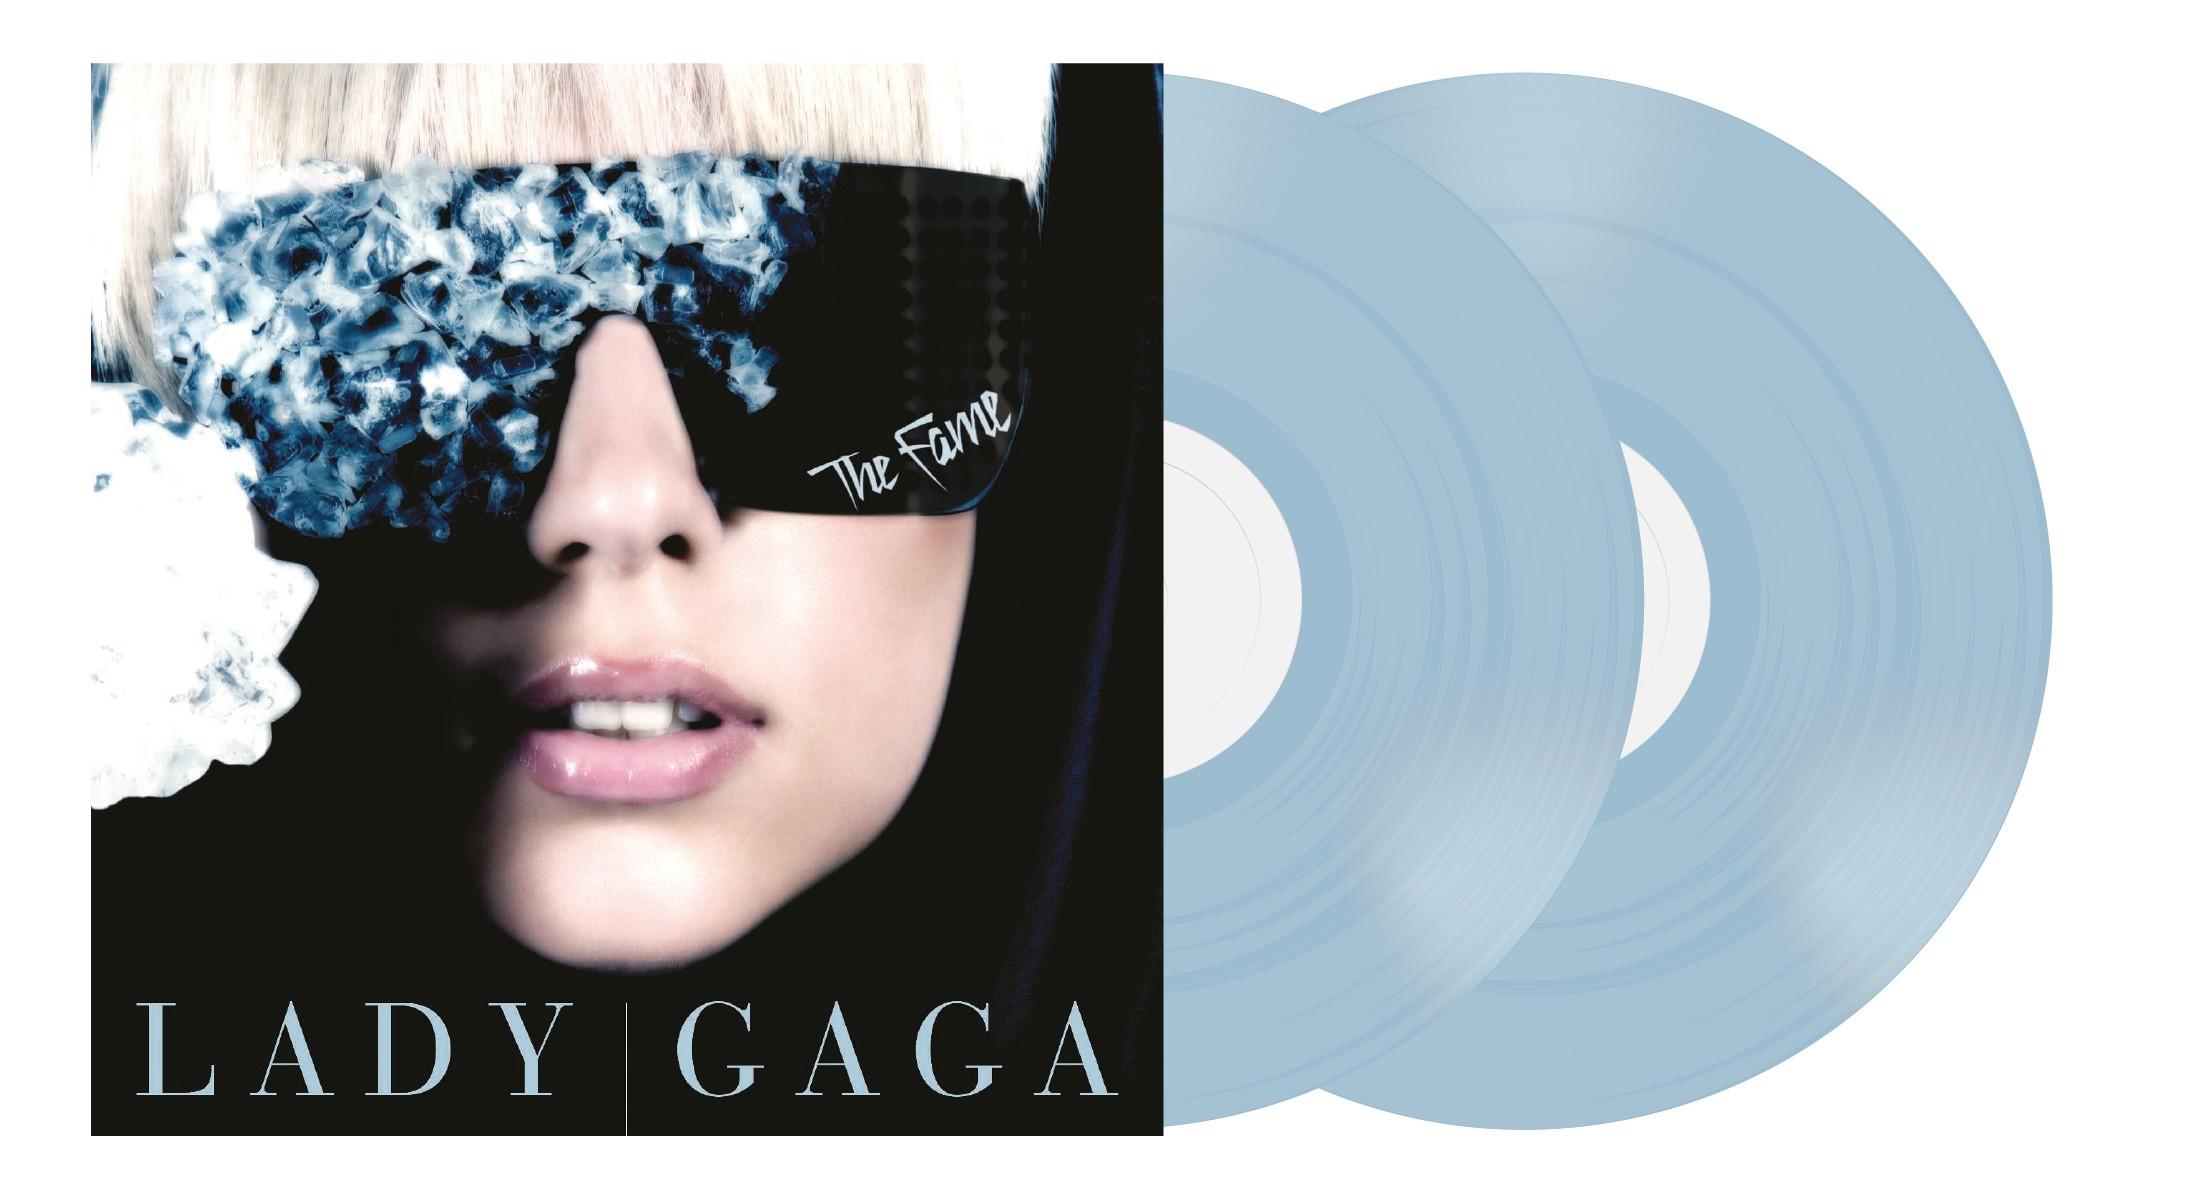 Lady Gaga - The Fame (Blue) 2XLP